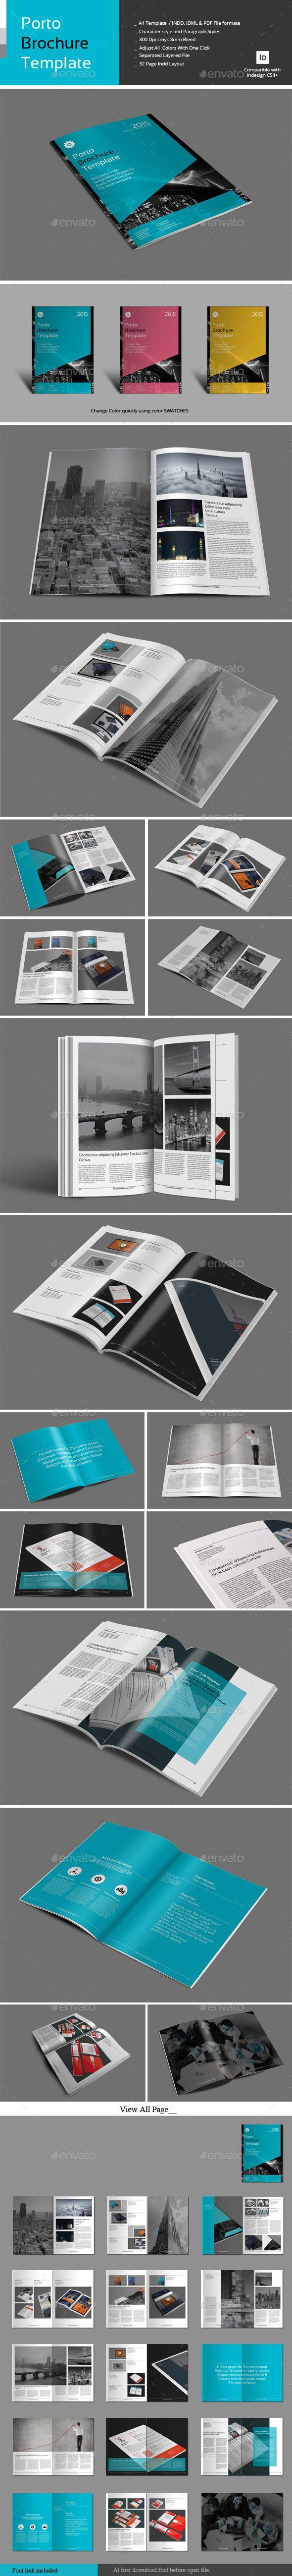 Porto Brochure Template Pinterest Brochure Template Brochures